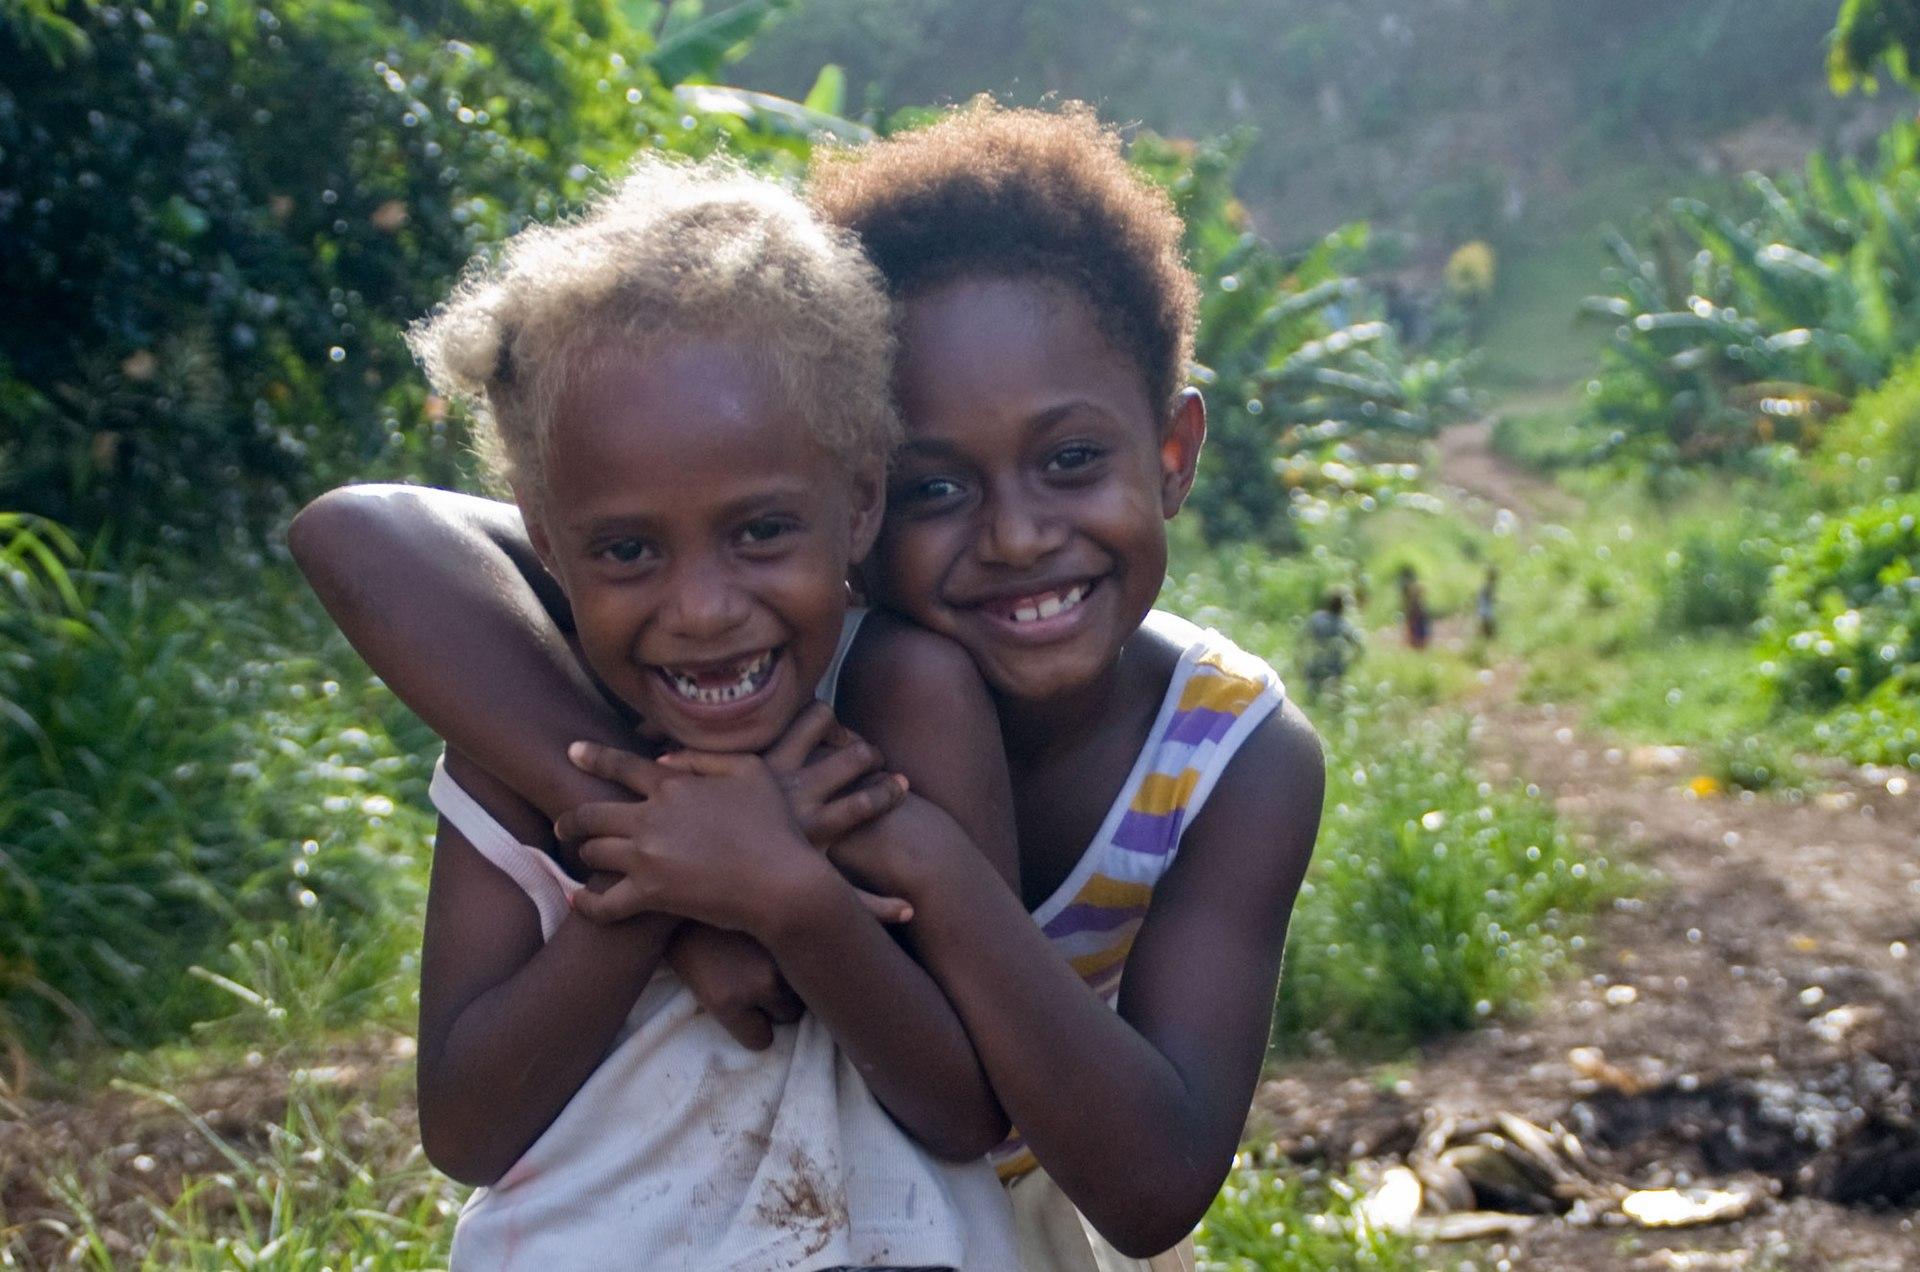 Vanuatu girl